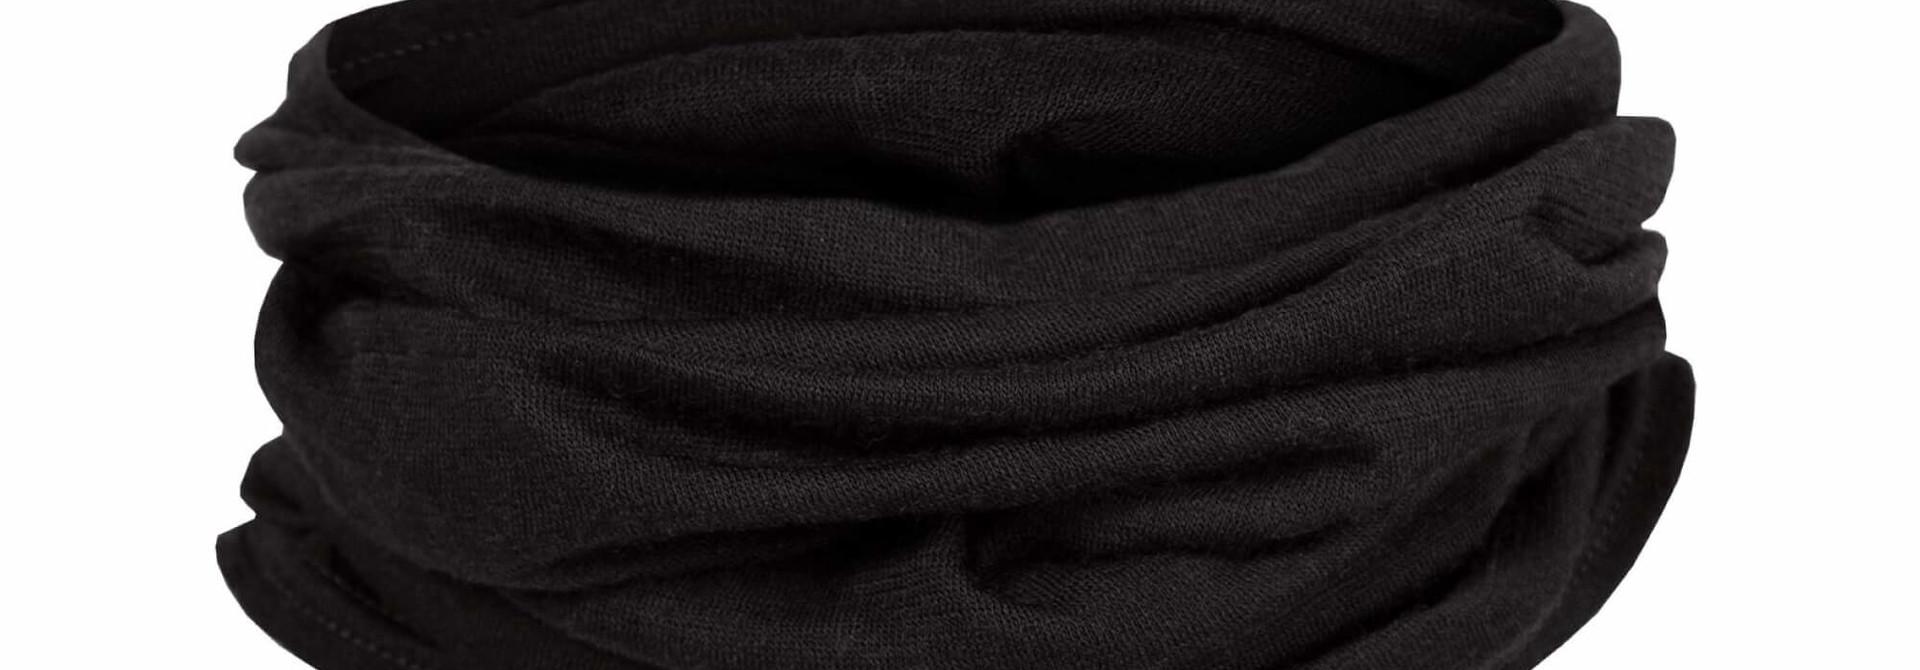 BaaBaa Merino Multitube